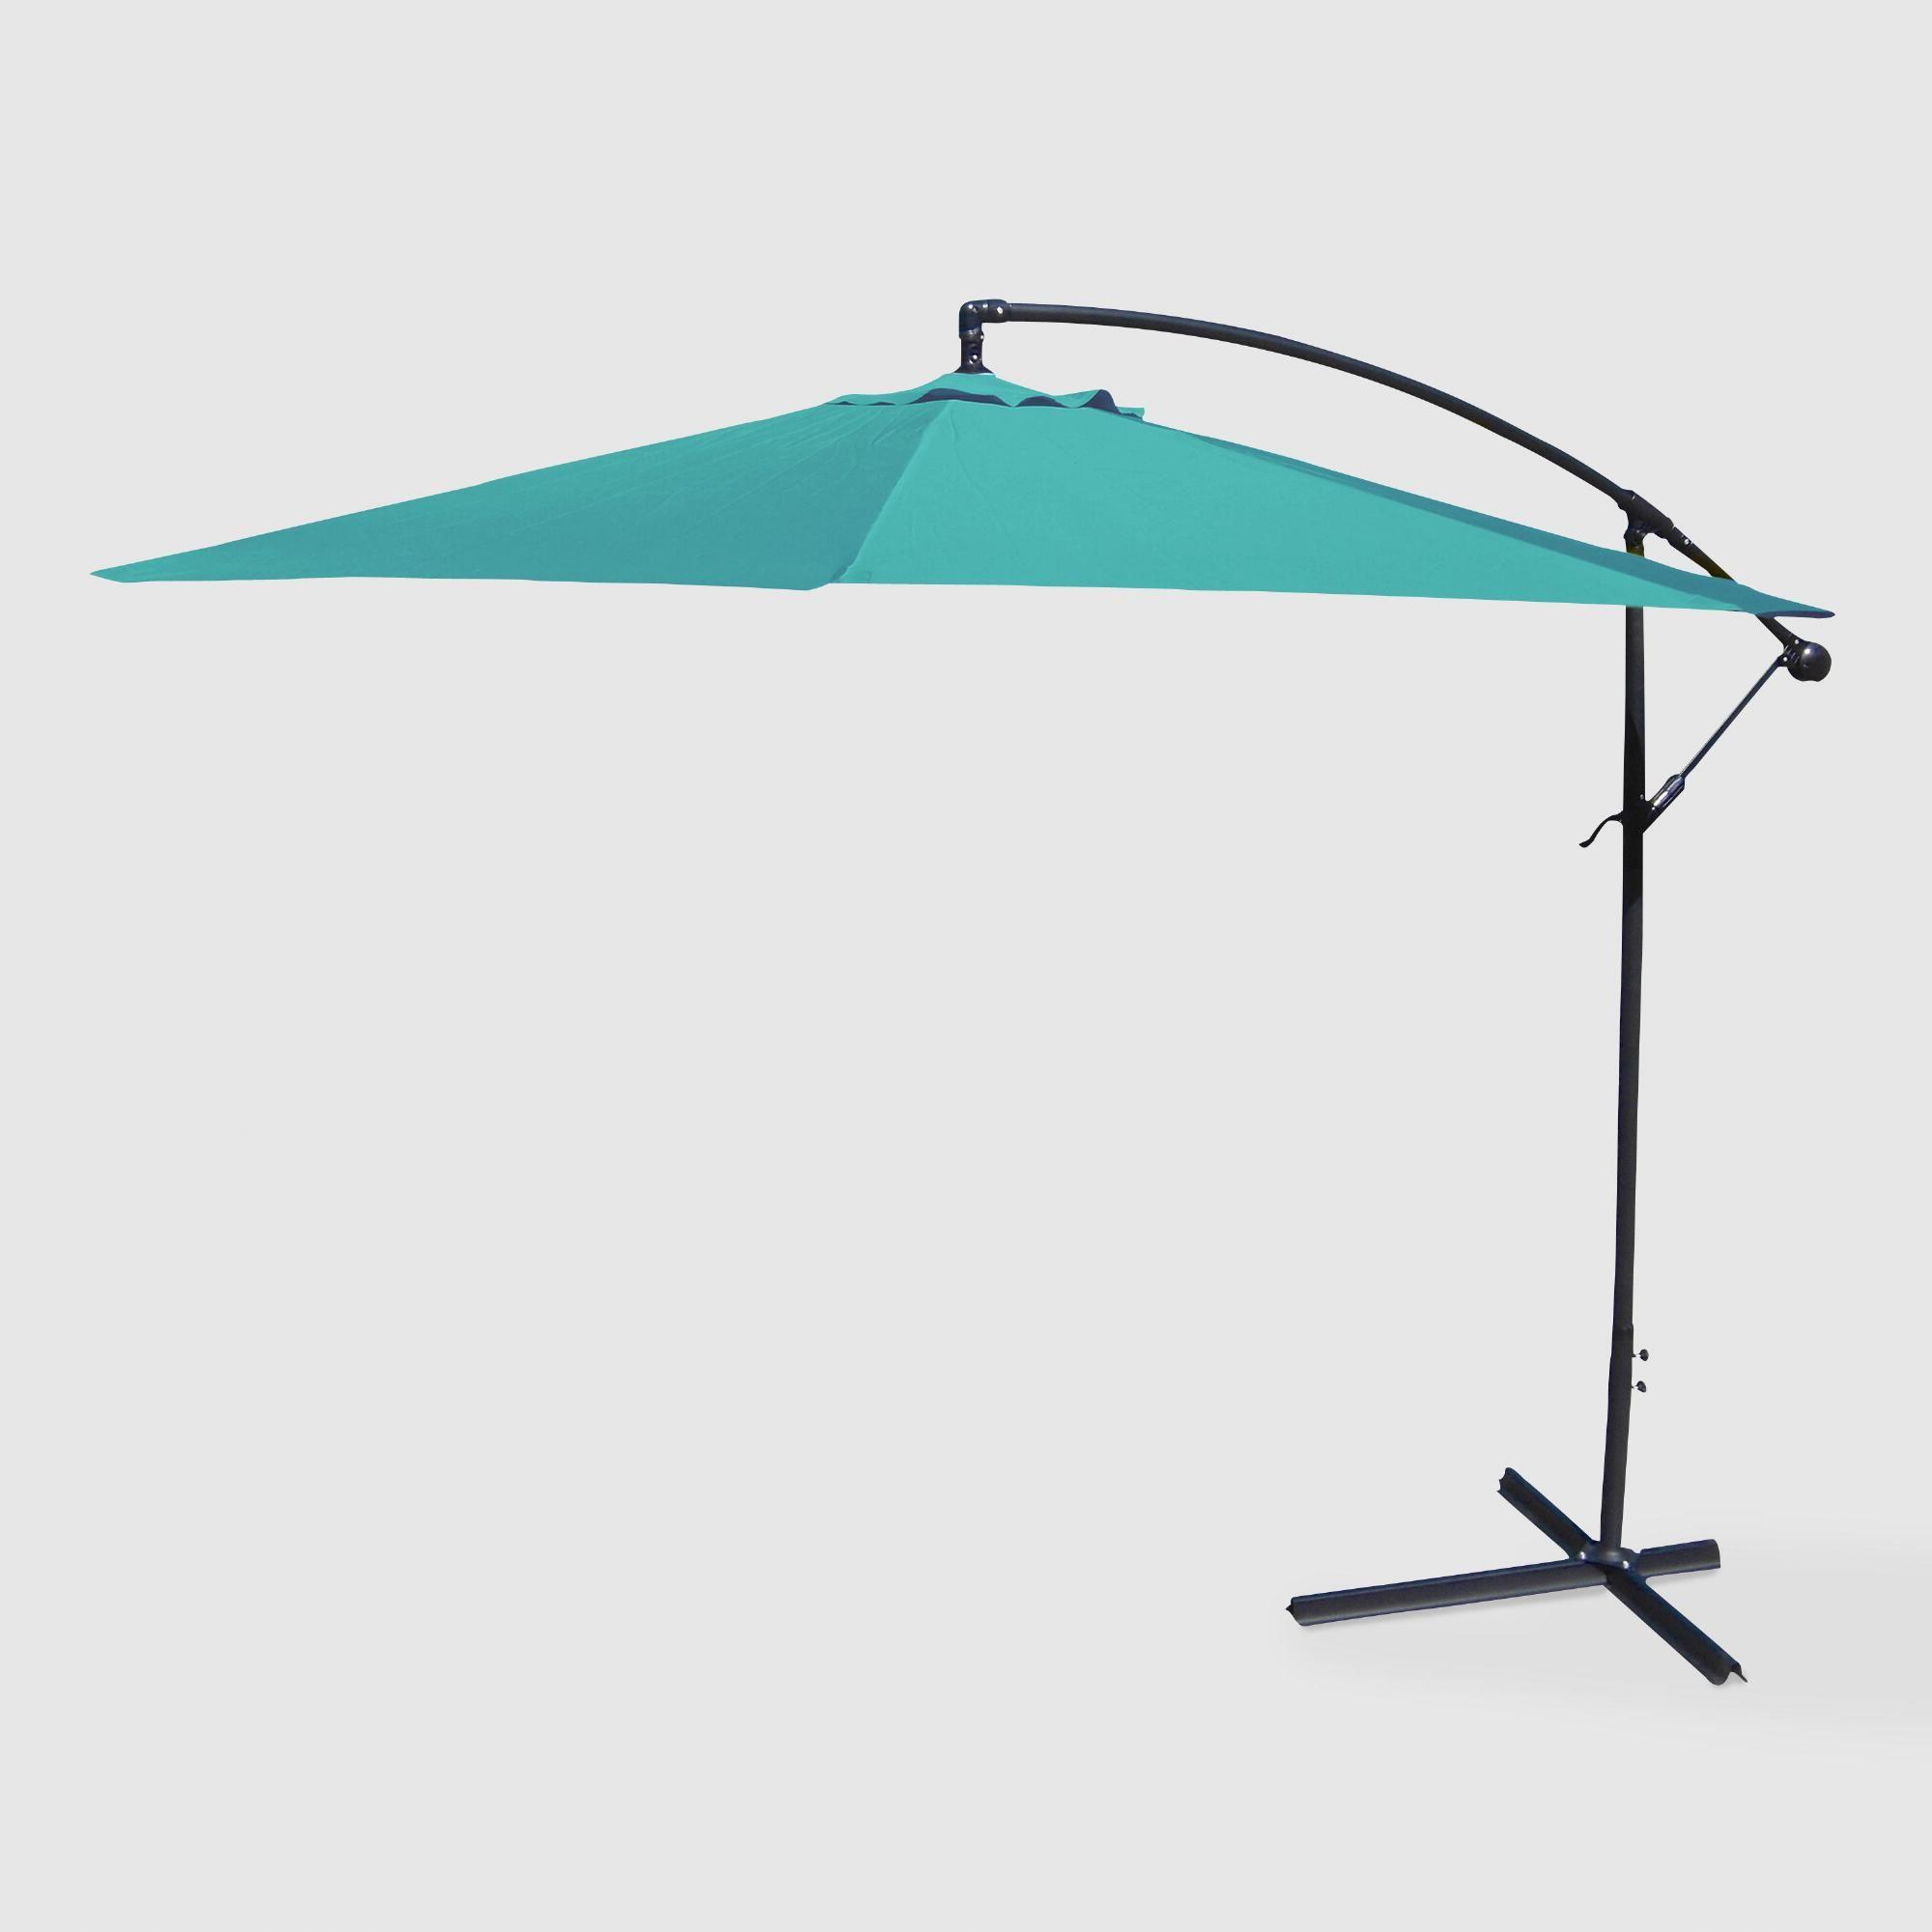 Lora Market Umbrellas In Most Recent Aruba Turquoise Cantilever Outdoor Patio Umbrella: Blue – Fabric (View 6 of 20)